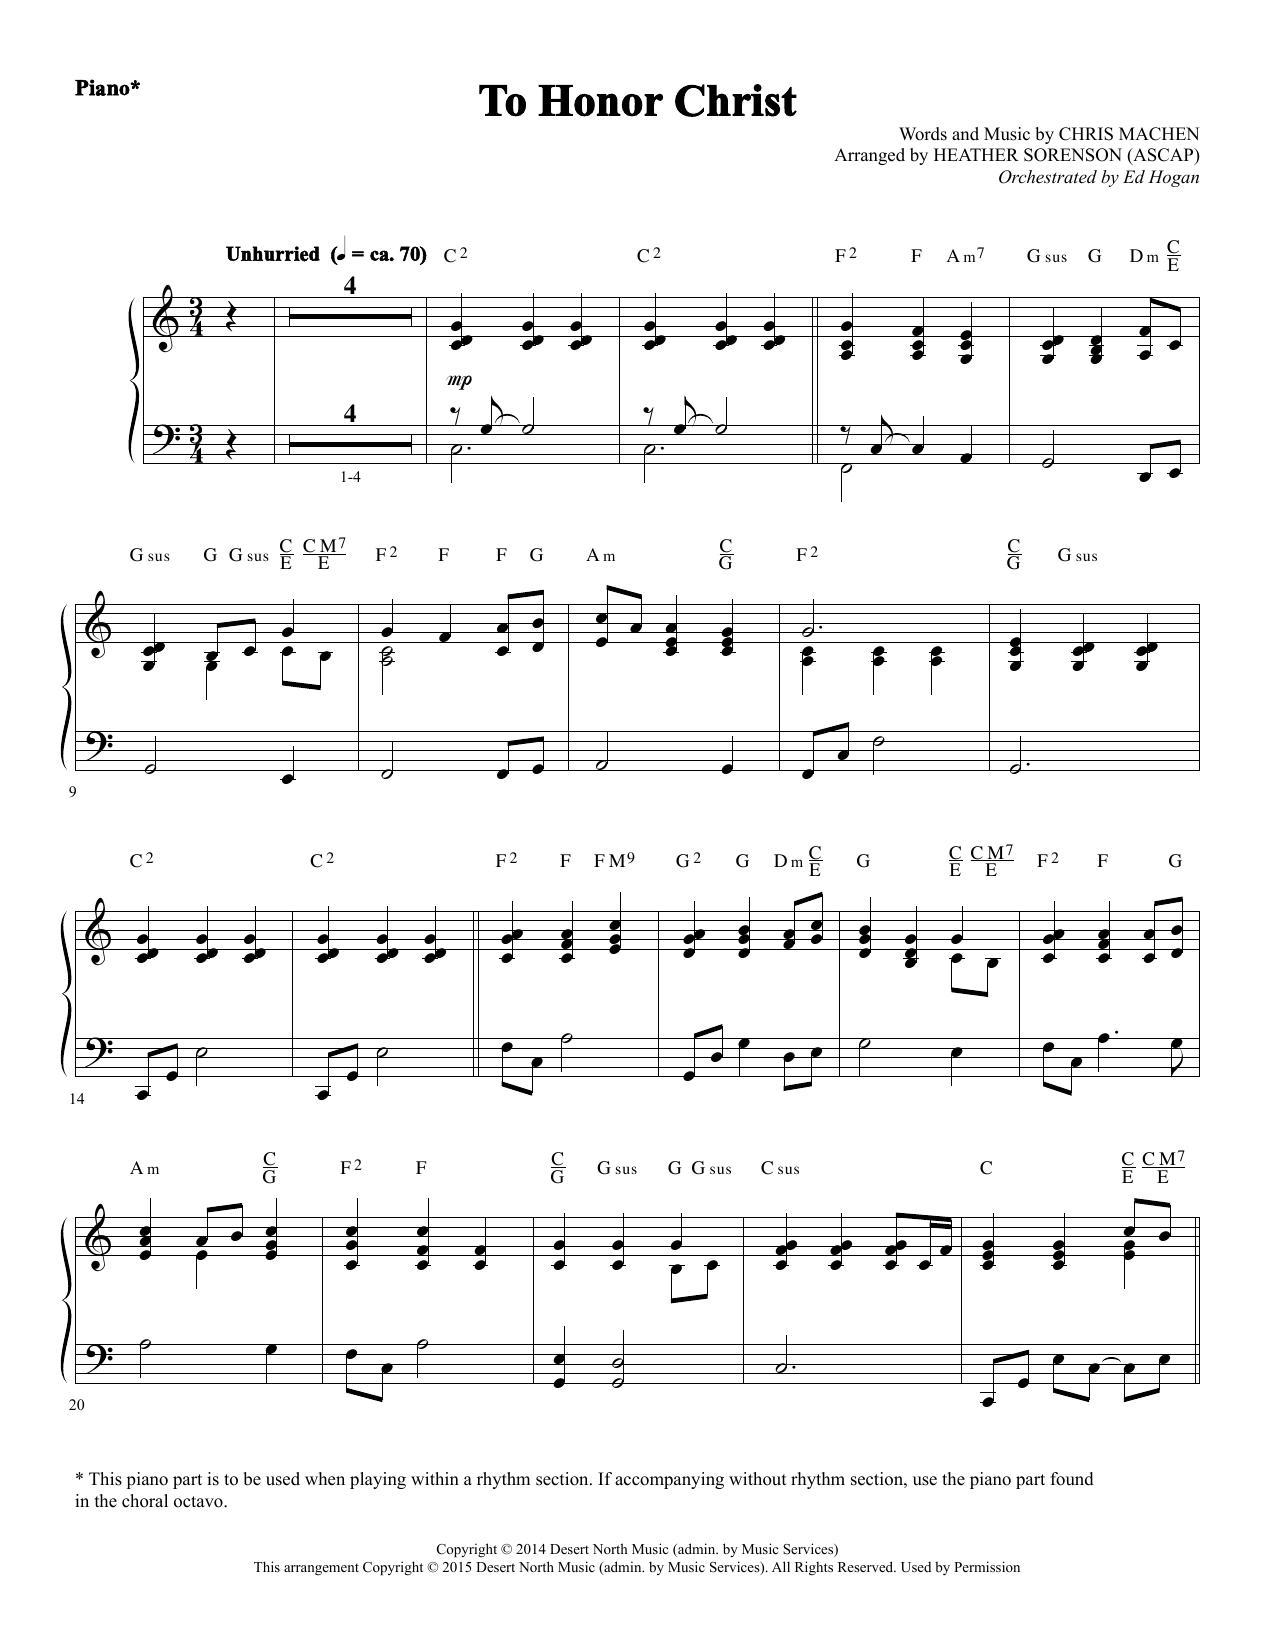 To Honor Christ - Piano Sheet Music